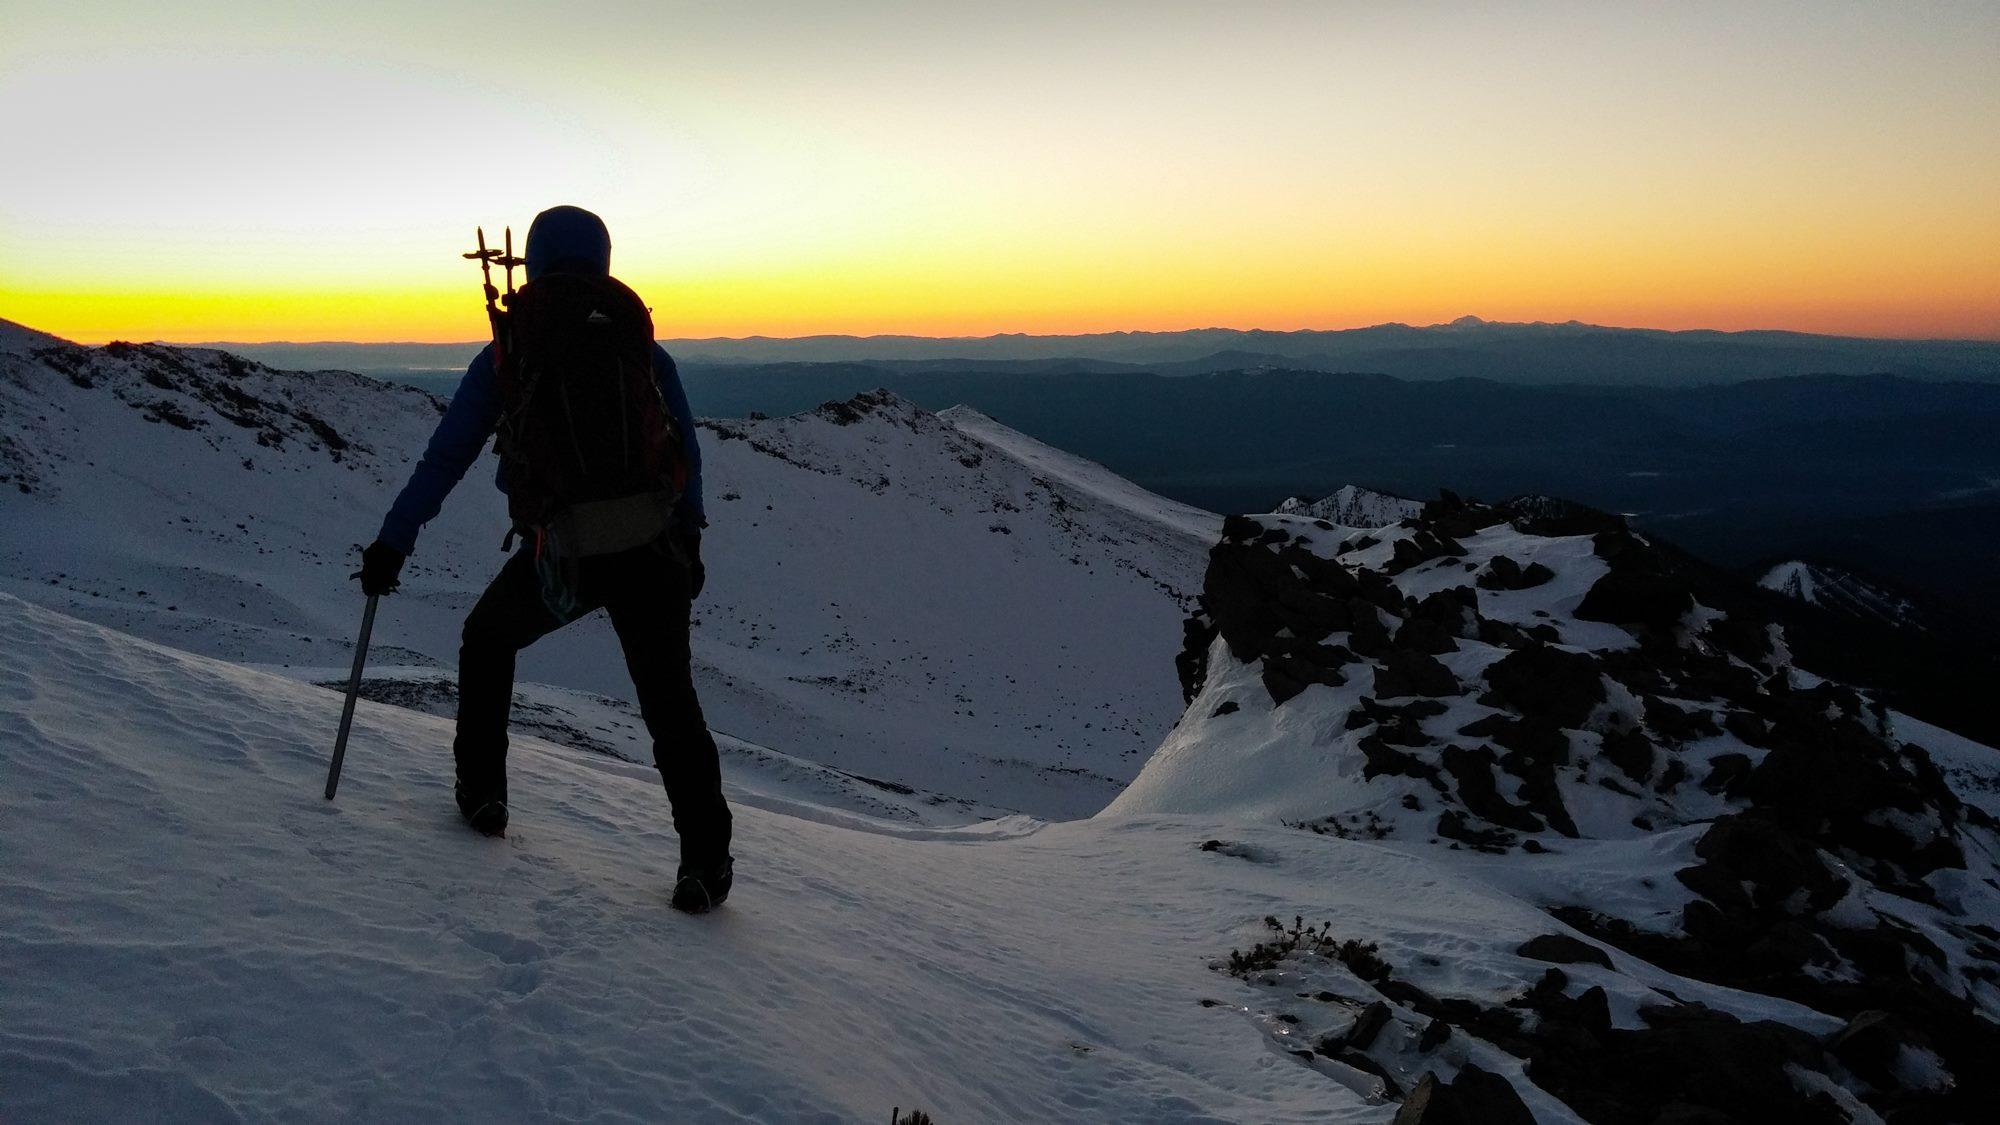 Sunrise over Mt Shasta